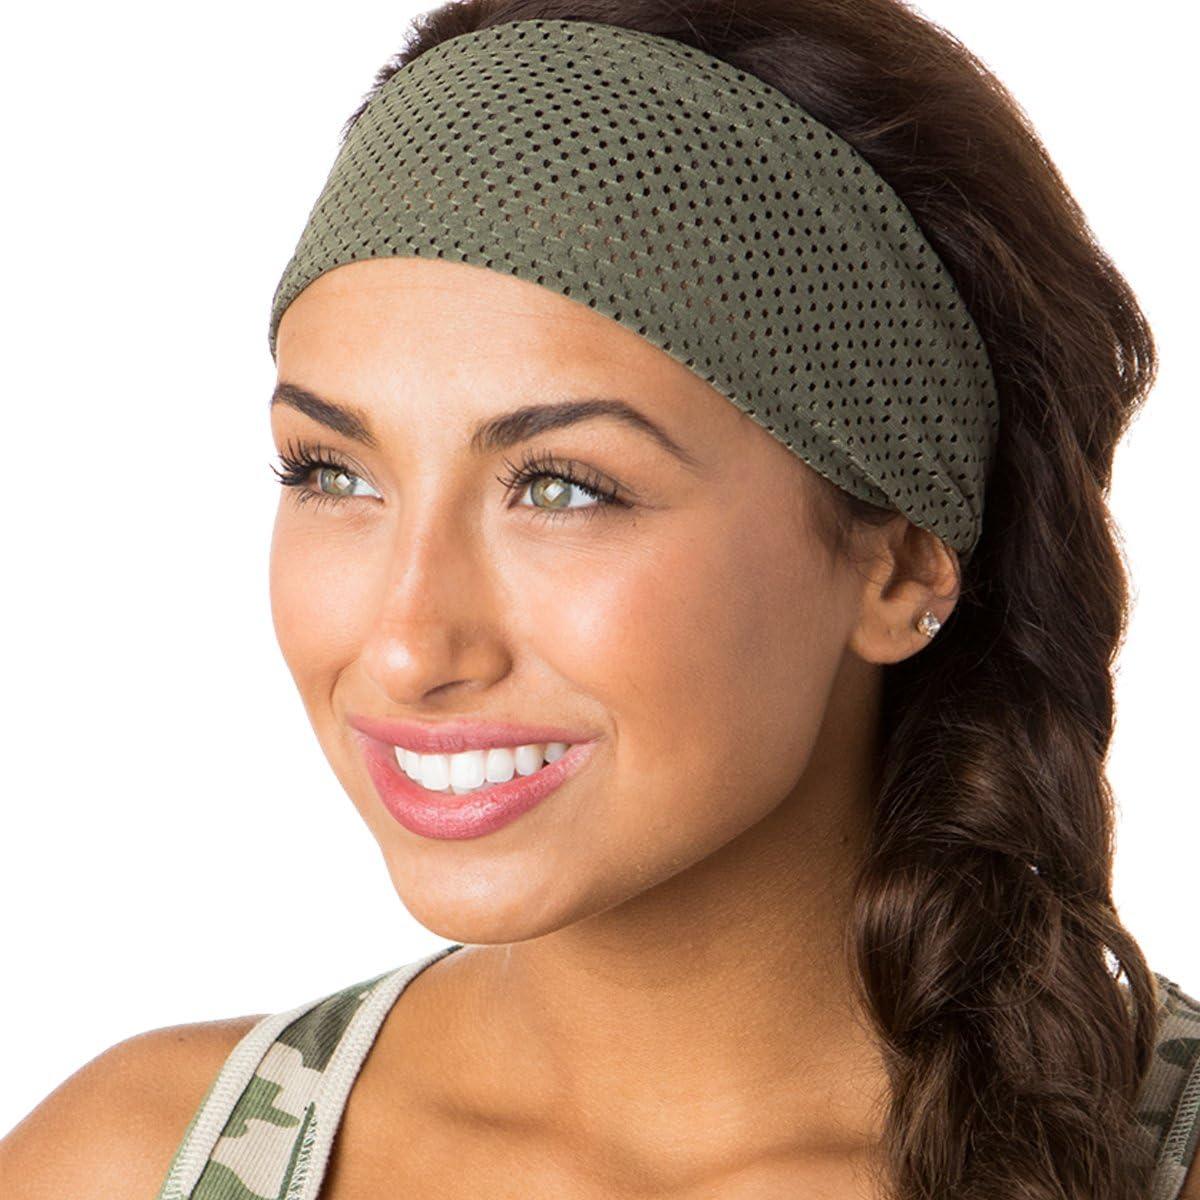 Hipsy Adjustable & Stretchy Jersey Xflex Wide Headbands for Women Girls & Teens